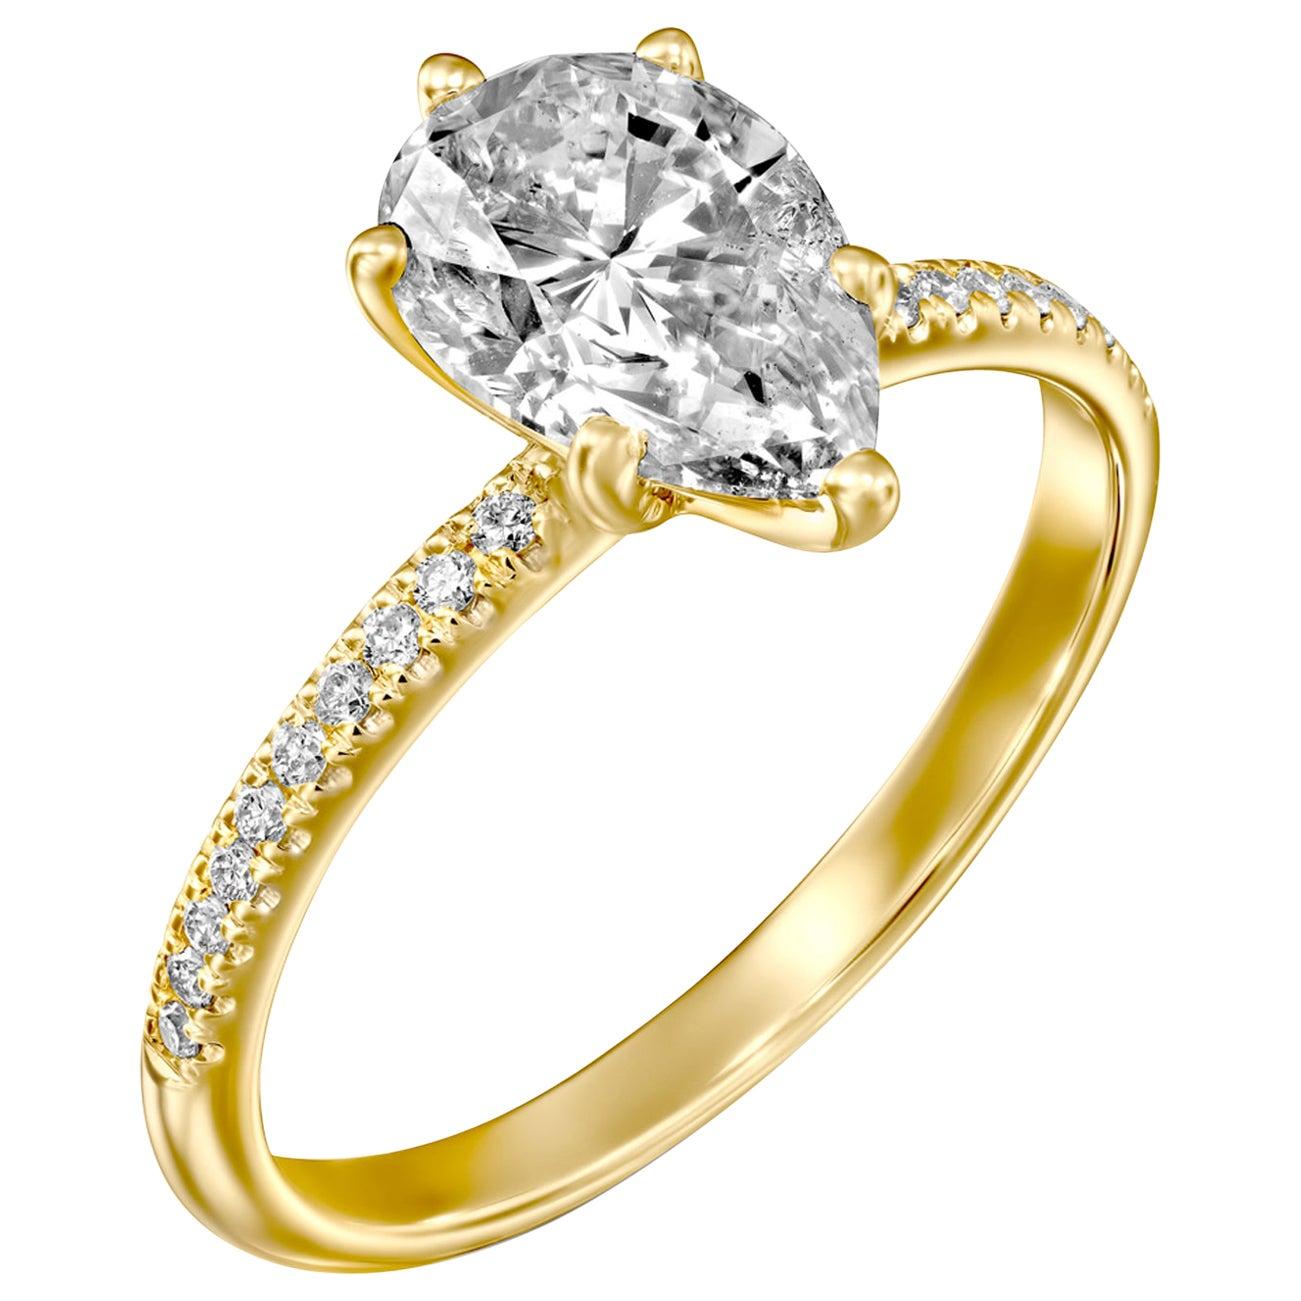 1.50 Carat GIA Pear Diamond Engagement Ring, Drop Shape Solitaire Diamond Ring